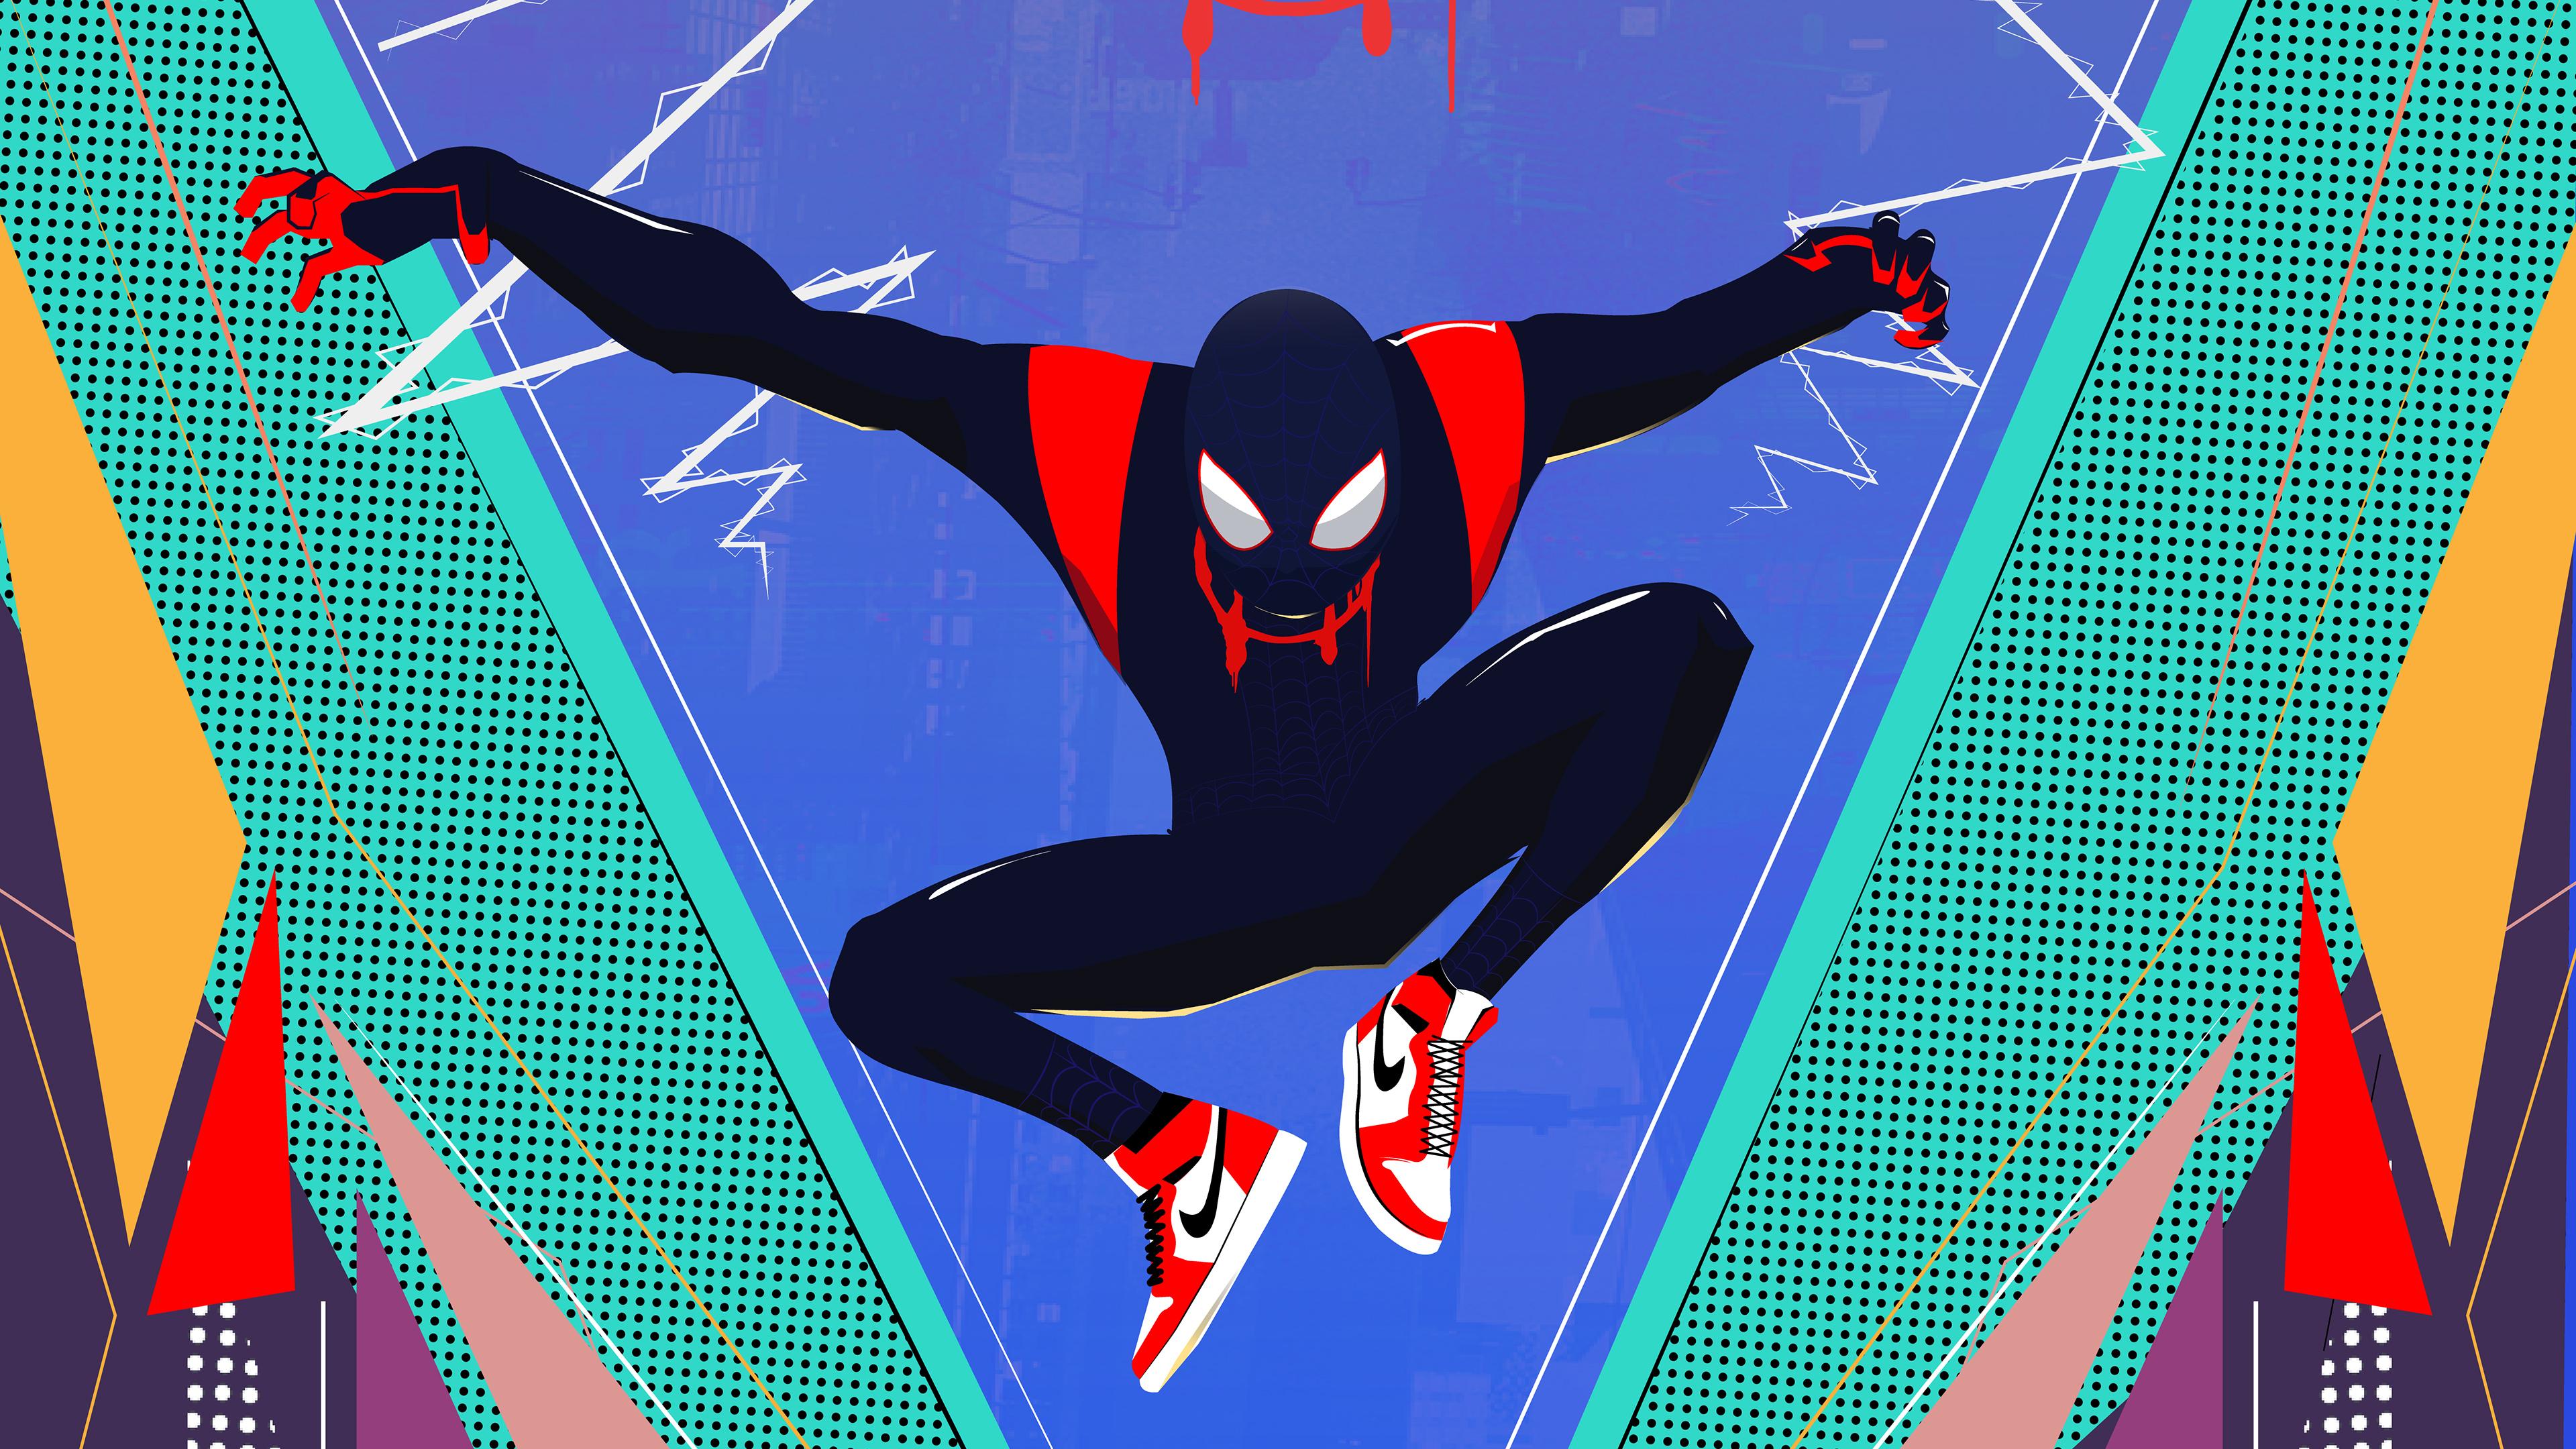 Spider Man Miles Morales New Hd Superheroes 4k Wallpapers